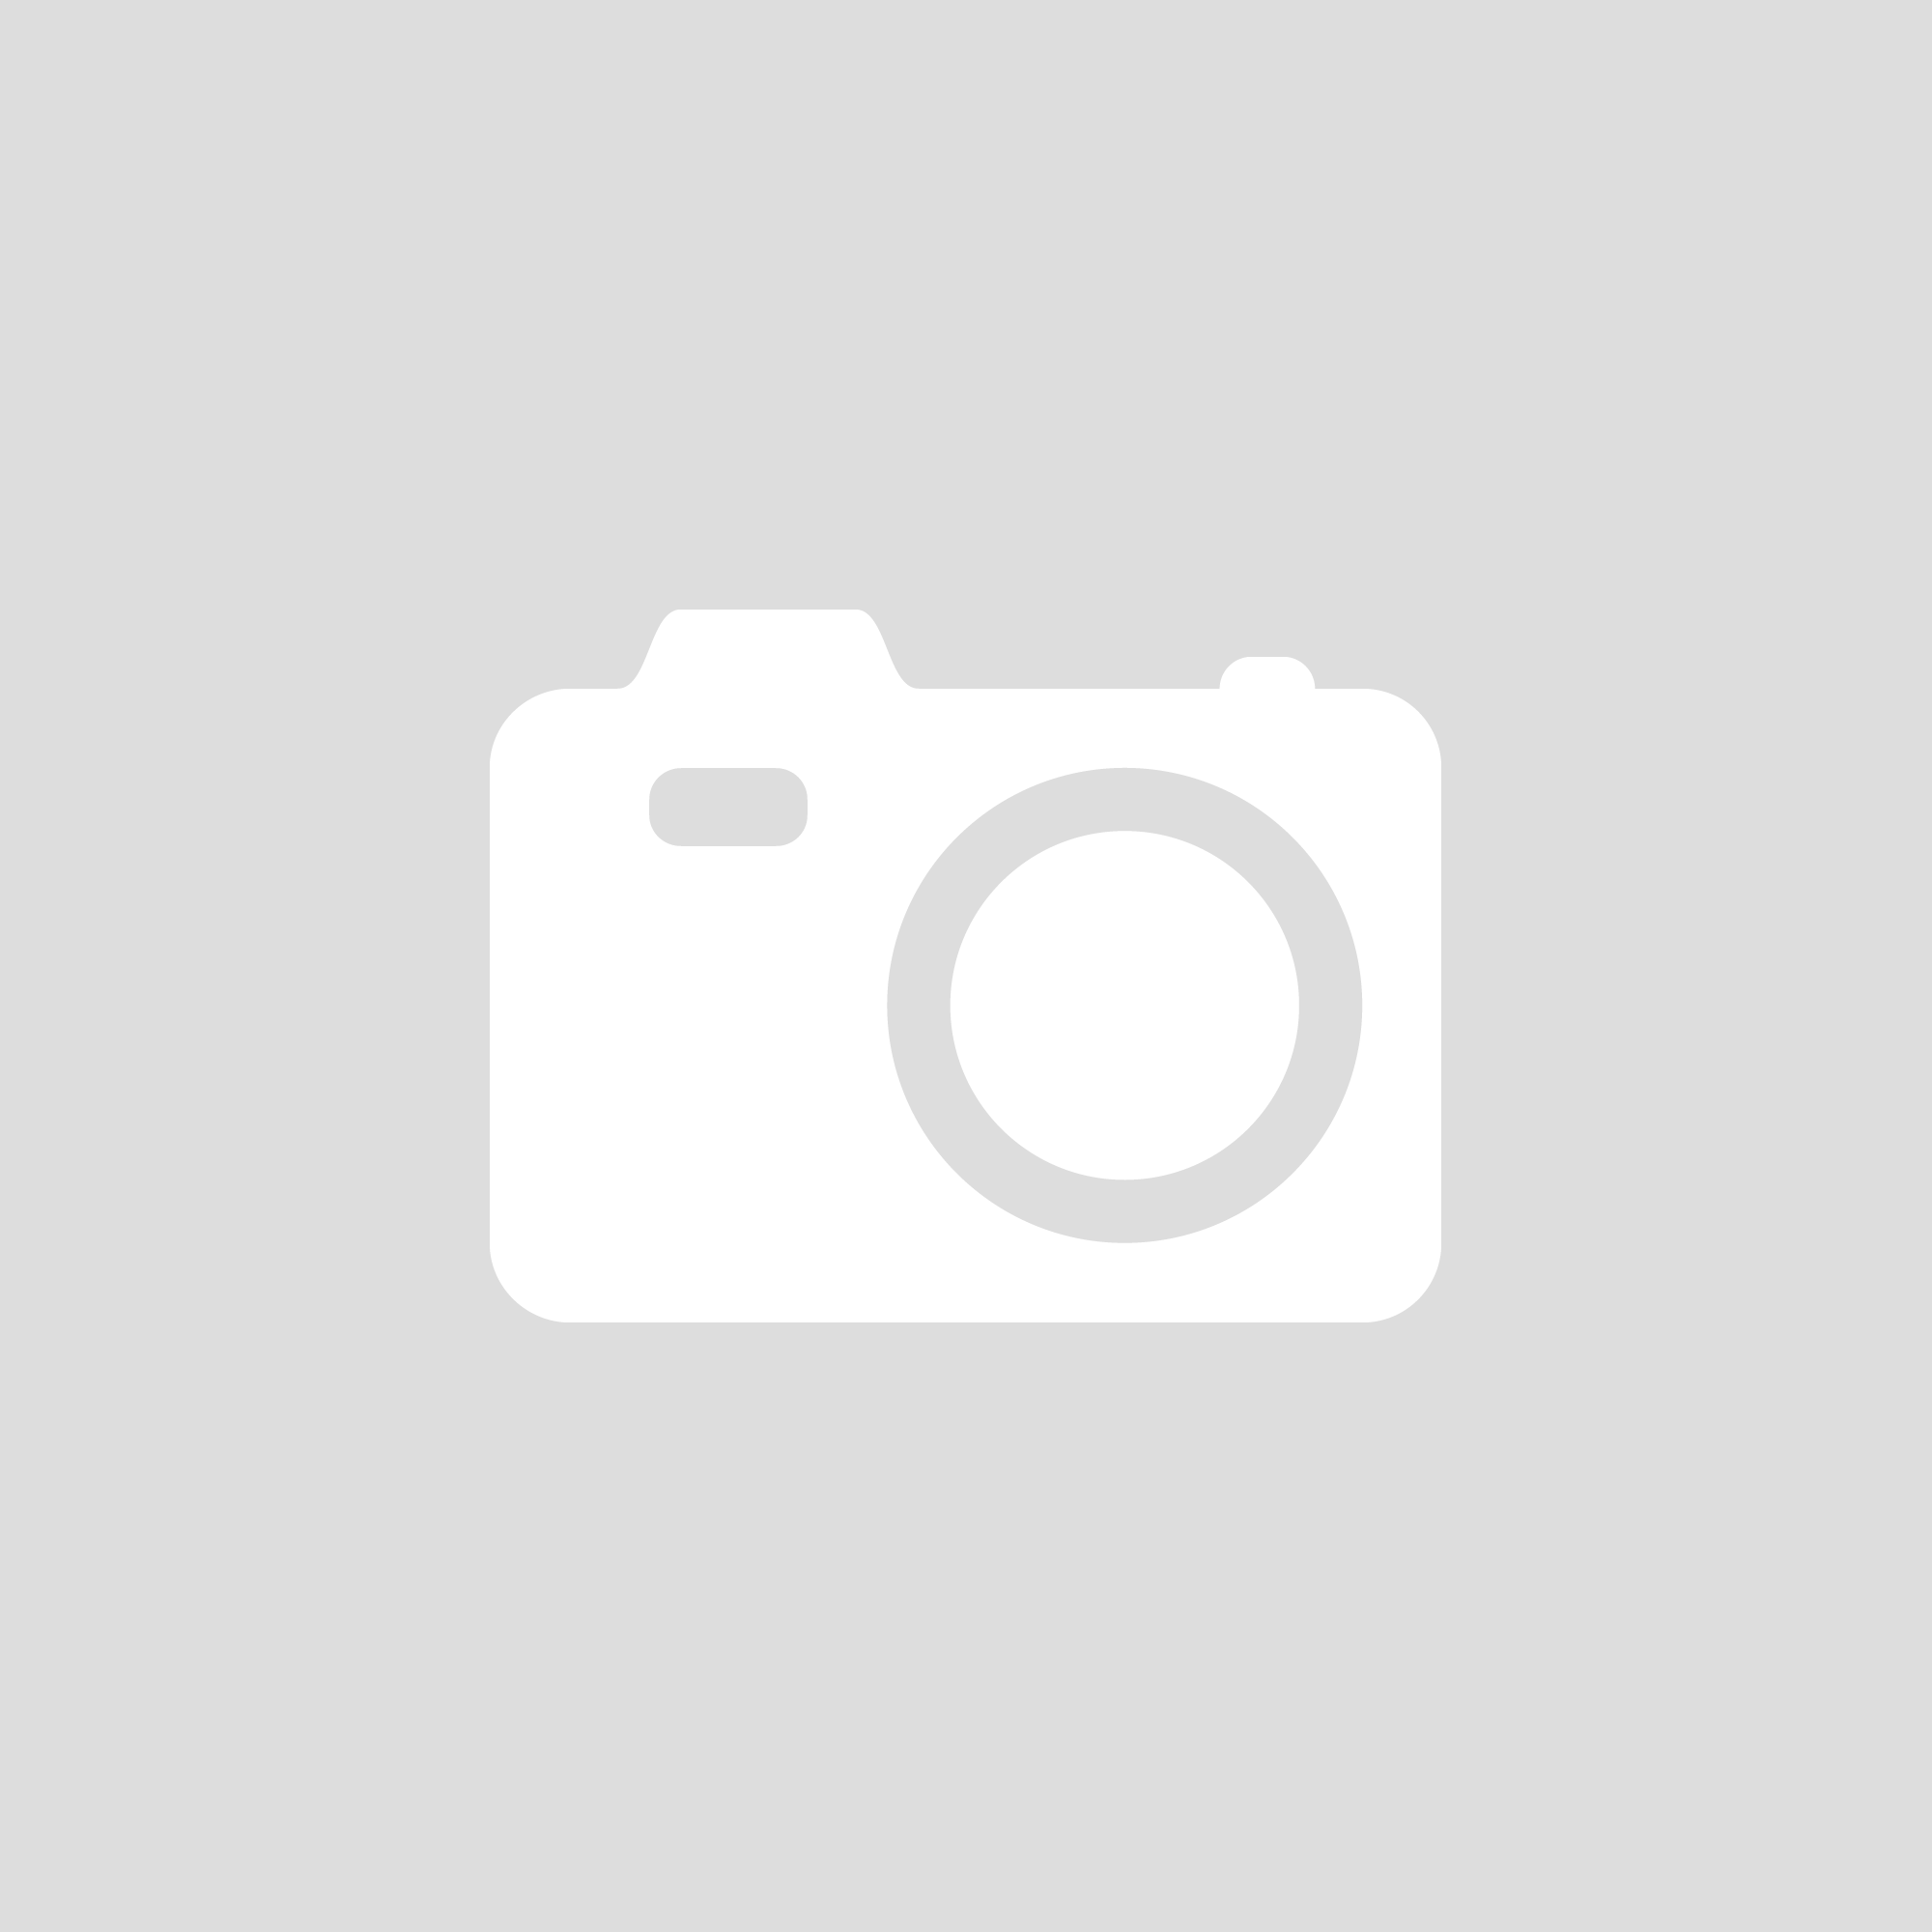 Tiffany Platinum Beige / Silver Wallpaper by Belgravia GB 161